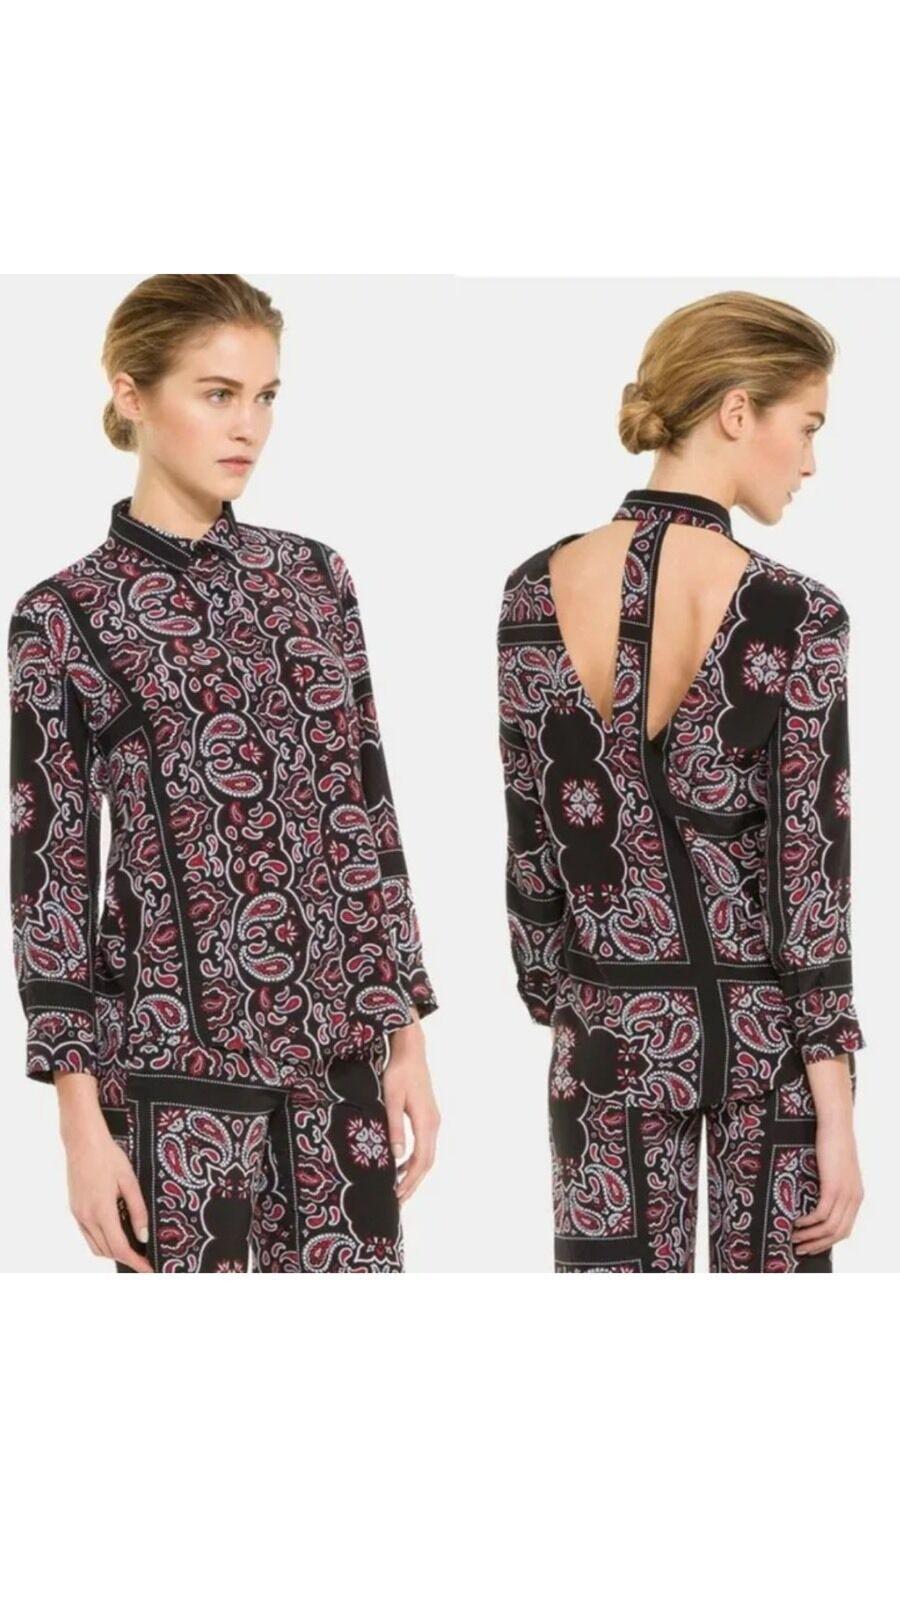 Rare Sandro Paris Cachemire Paisley Print Back Cutout Silk Blouse - schwarz rot